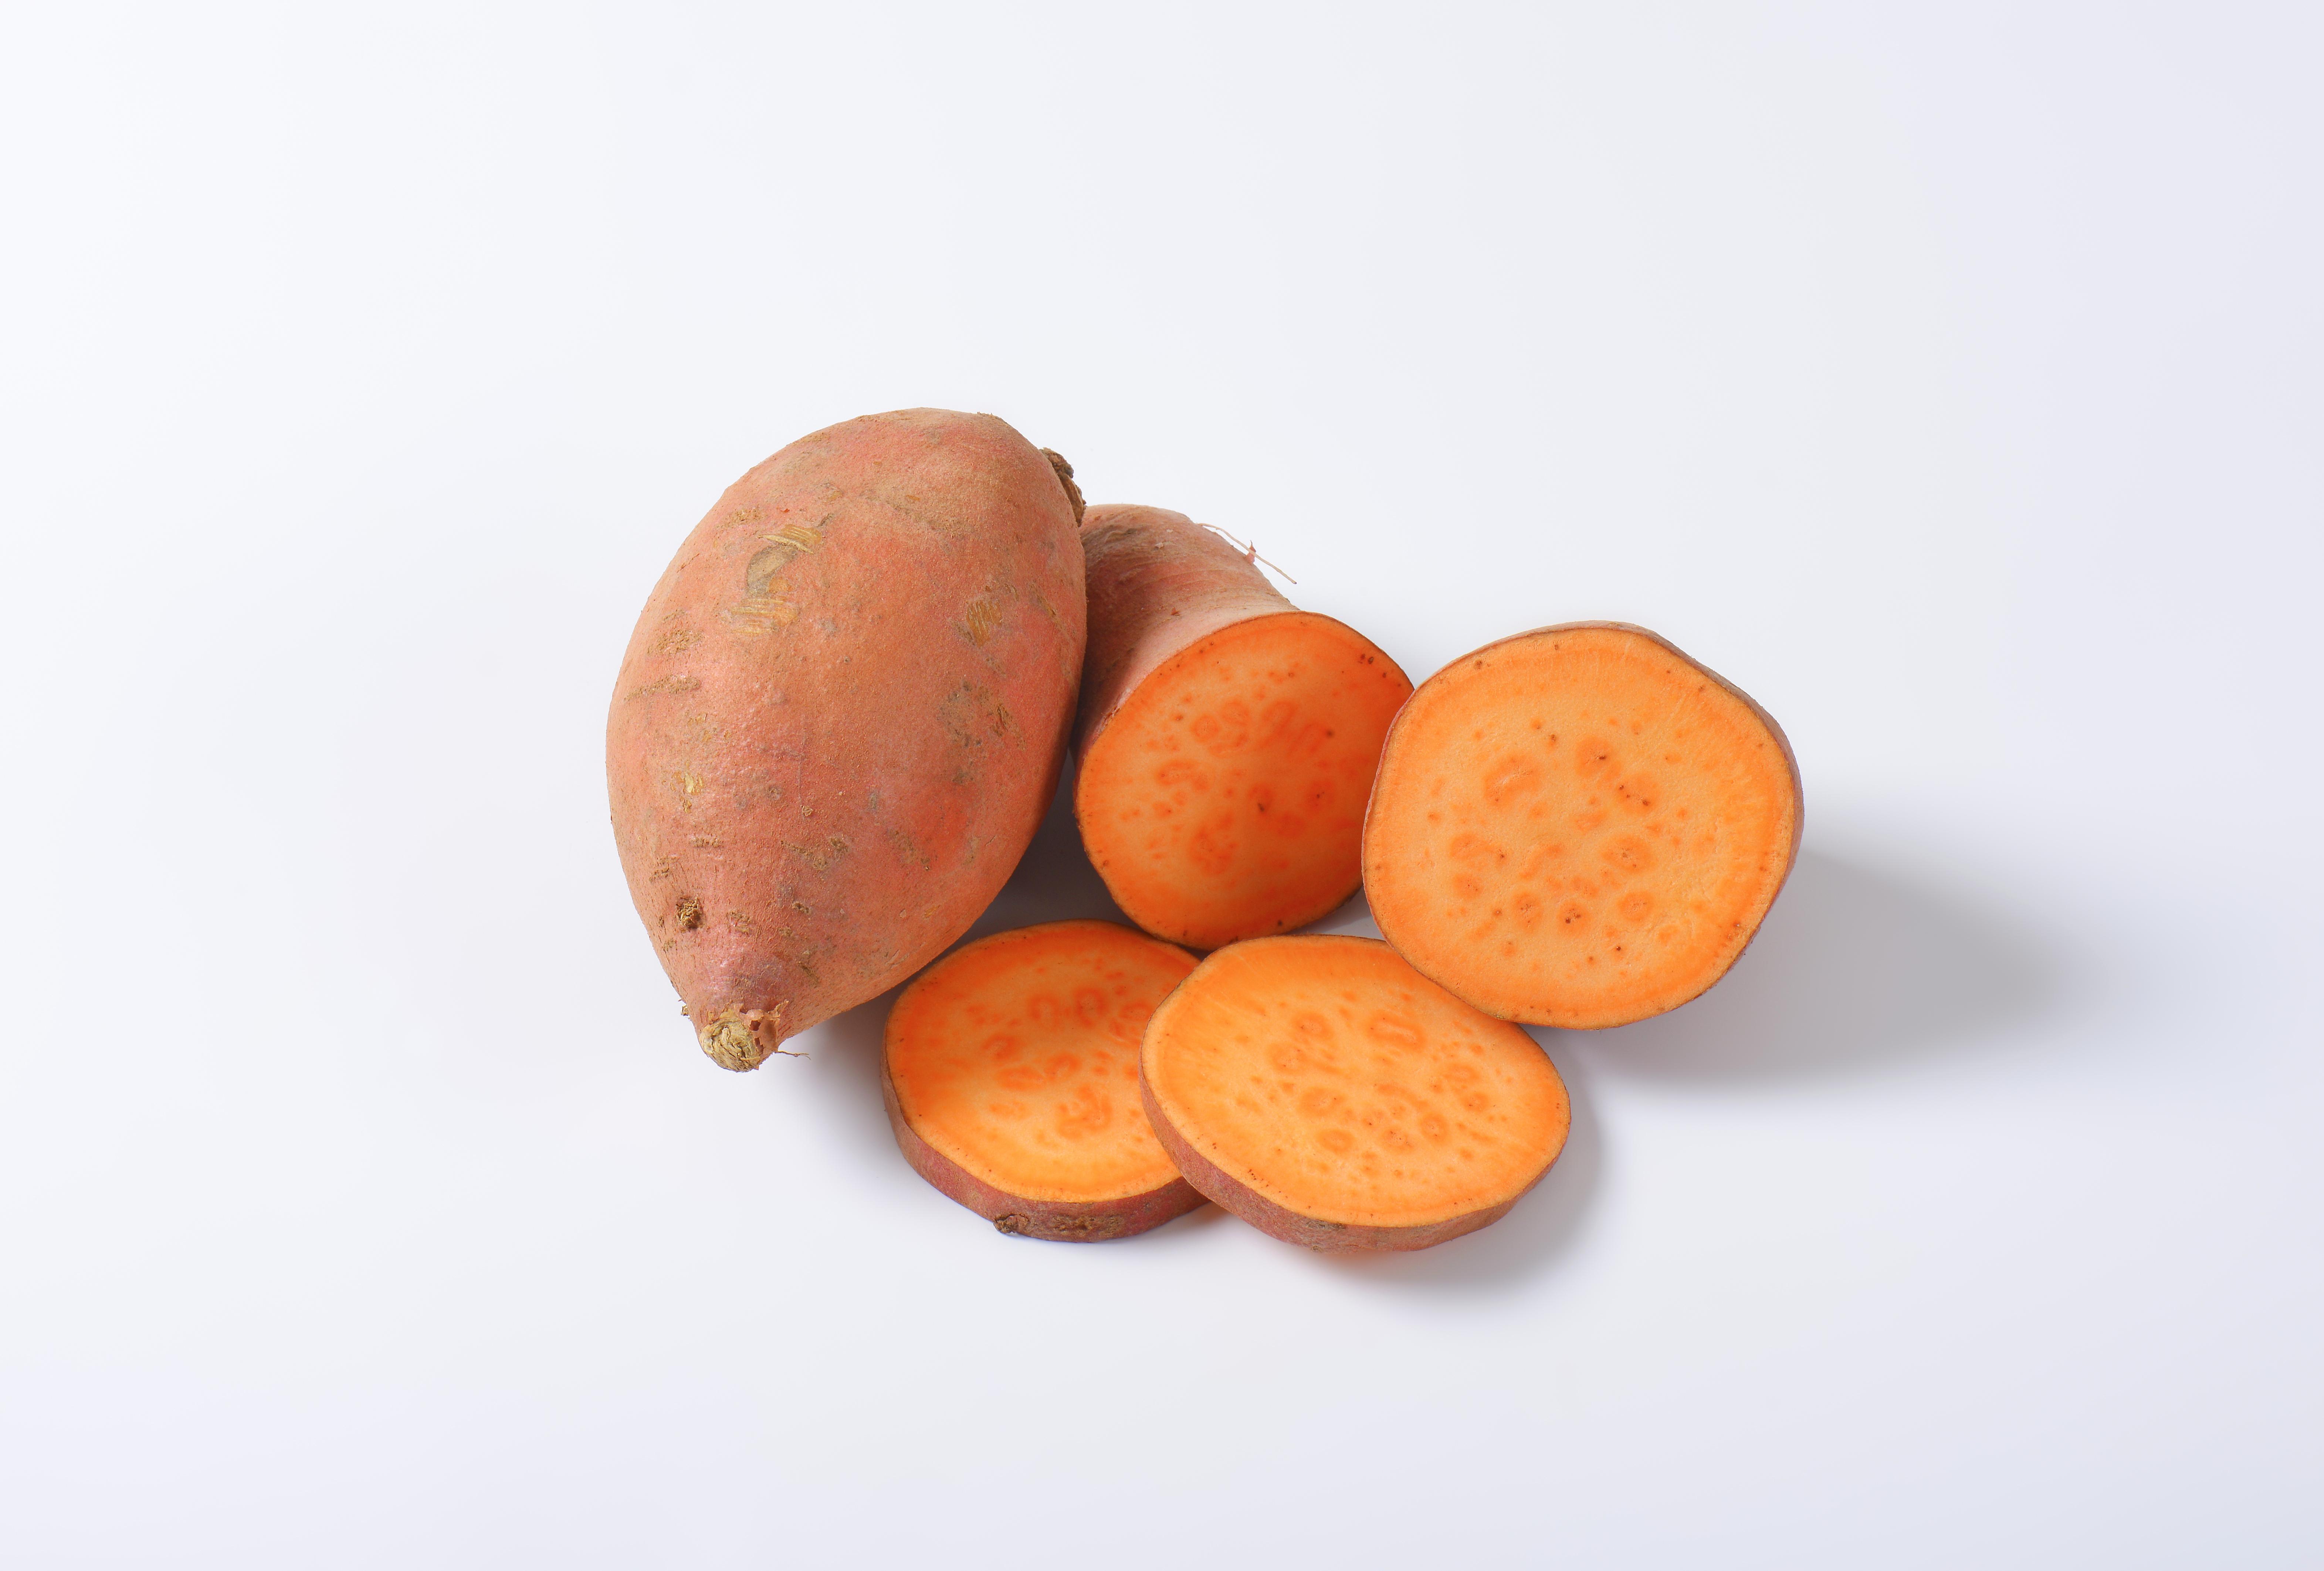 Are Potato Skins Healthy? | LEAFtv